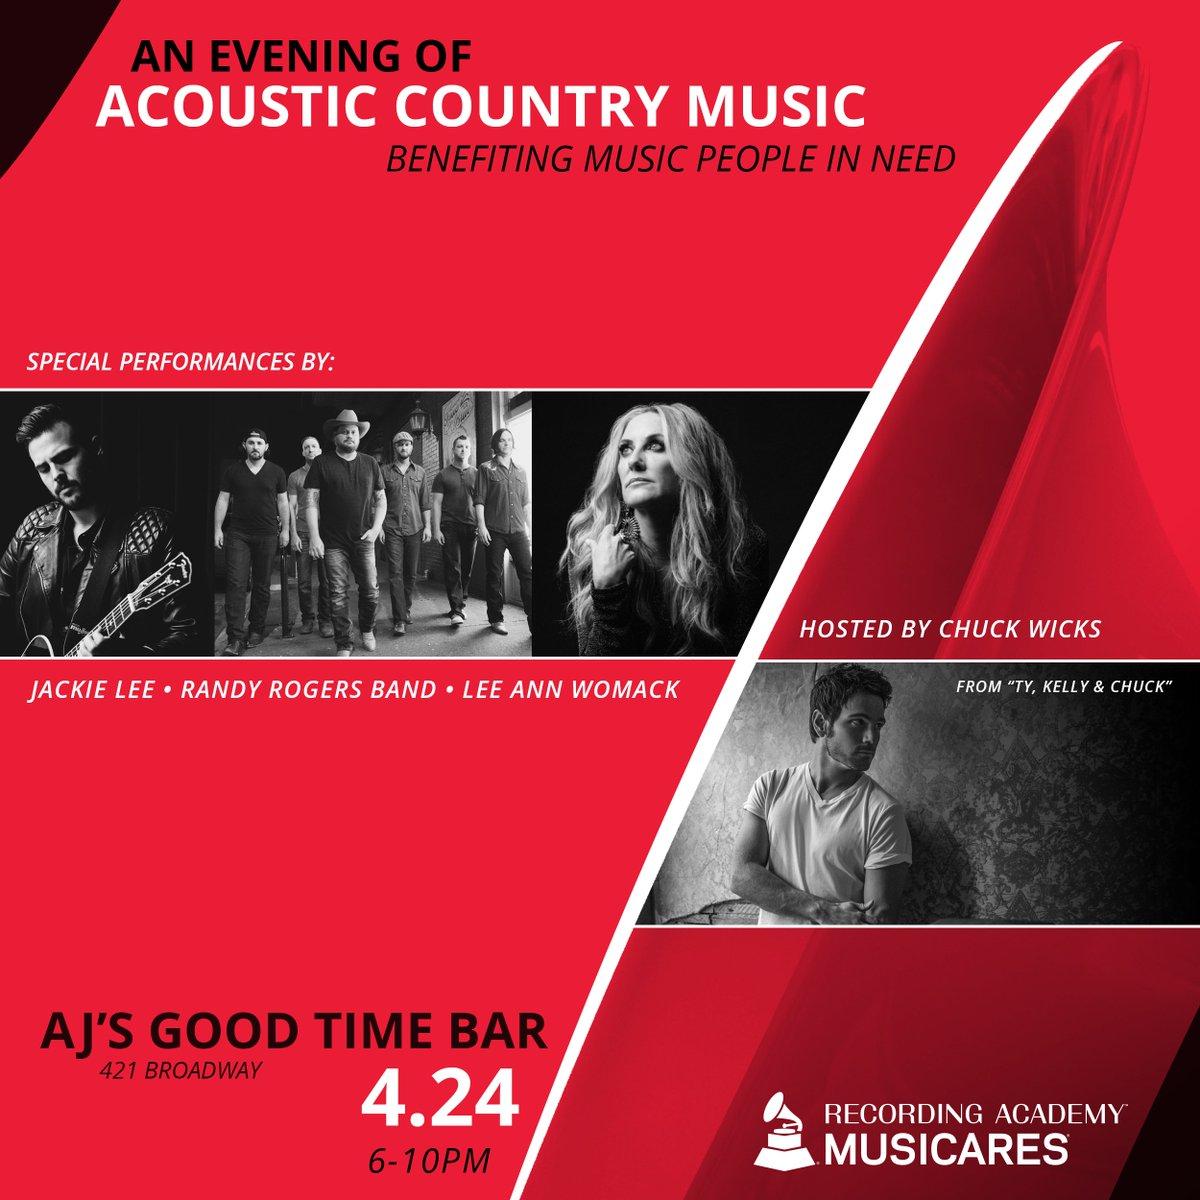 ASCAP on Twitter: